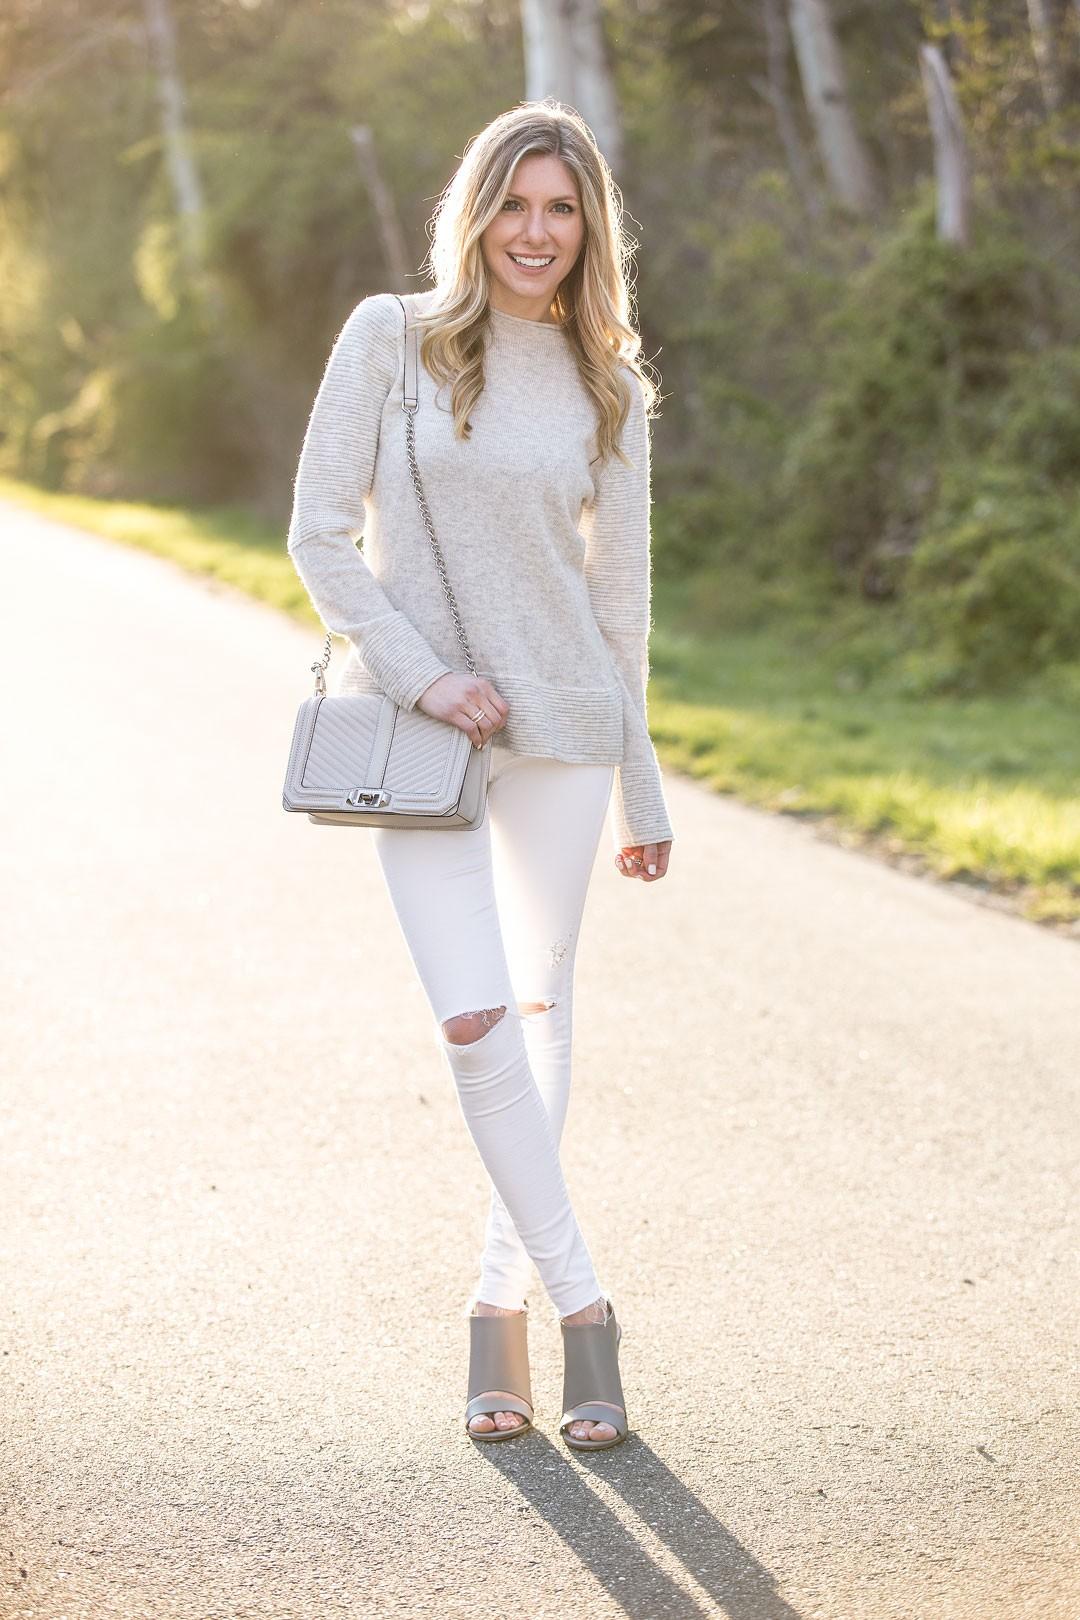 rebecca minkoff bag and j.crew cashmere sweater